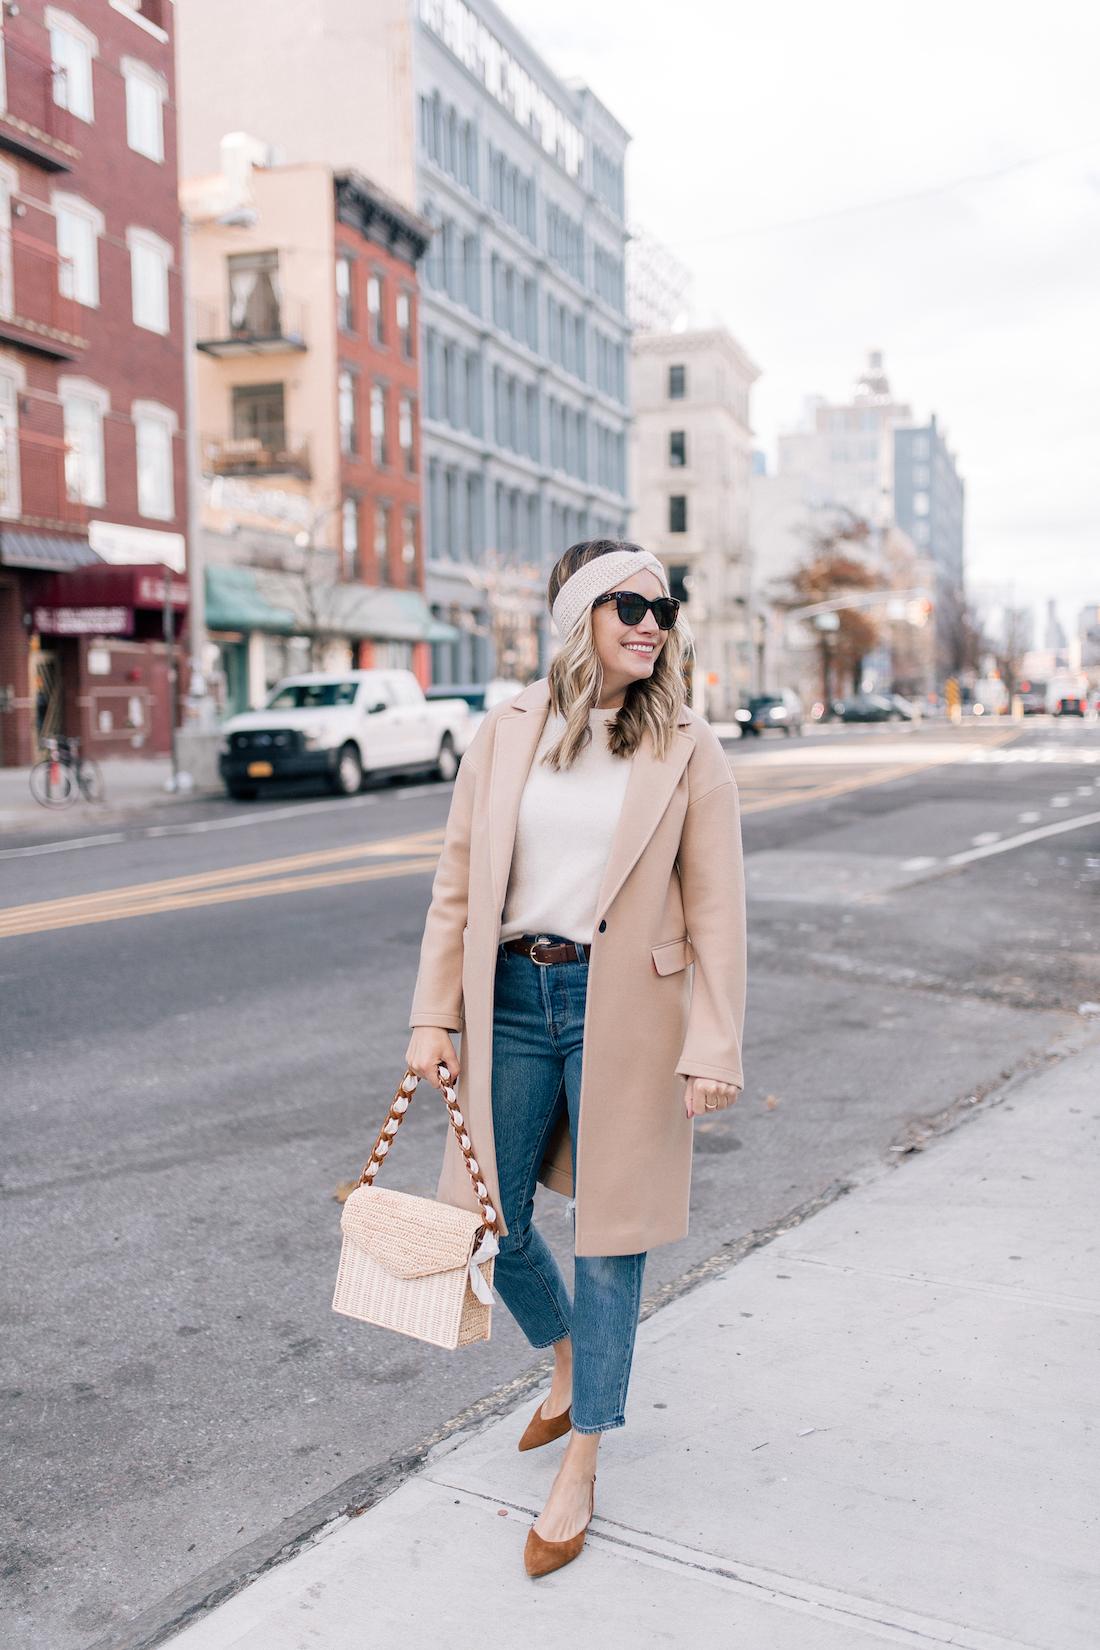 Grace Outfit:Topshop Coat(exact) // Eileen Fisher Sweater(c/o) // Eileen Fisher Headband (c/o)// Levi's Jeans // Polaroid Sunglasses // Pamela Munson Bag (c/o) // Sarah Flint Heels // J.Crew Belt